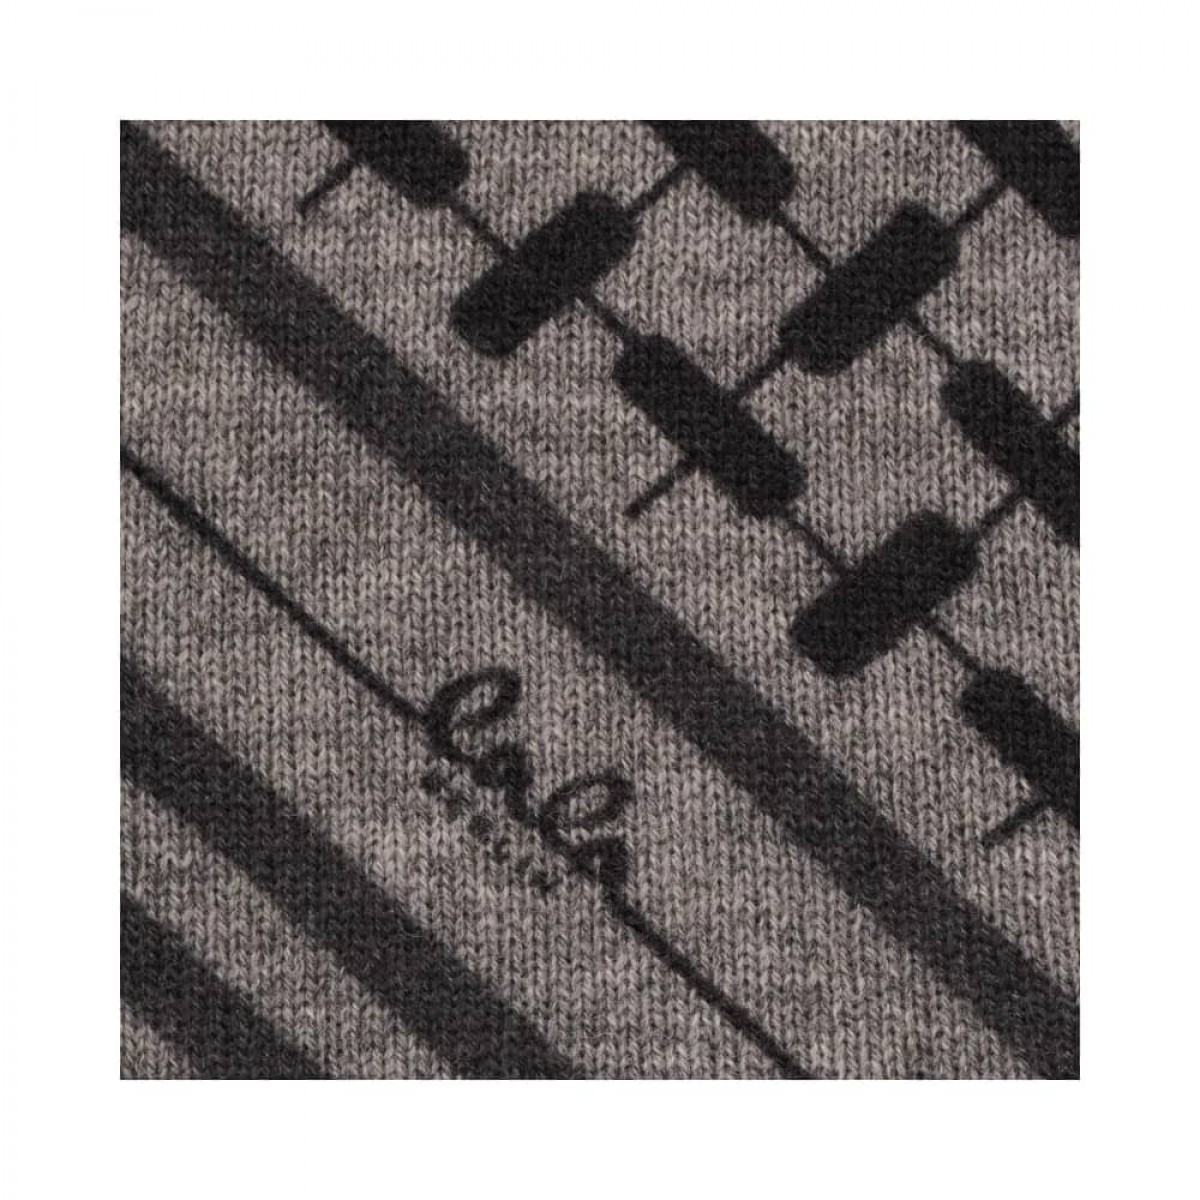 tube trinity aladdin - grey - mønster